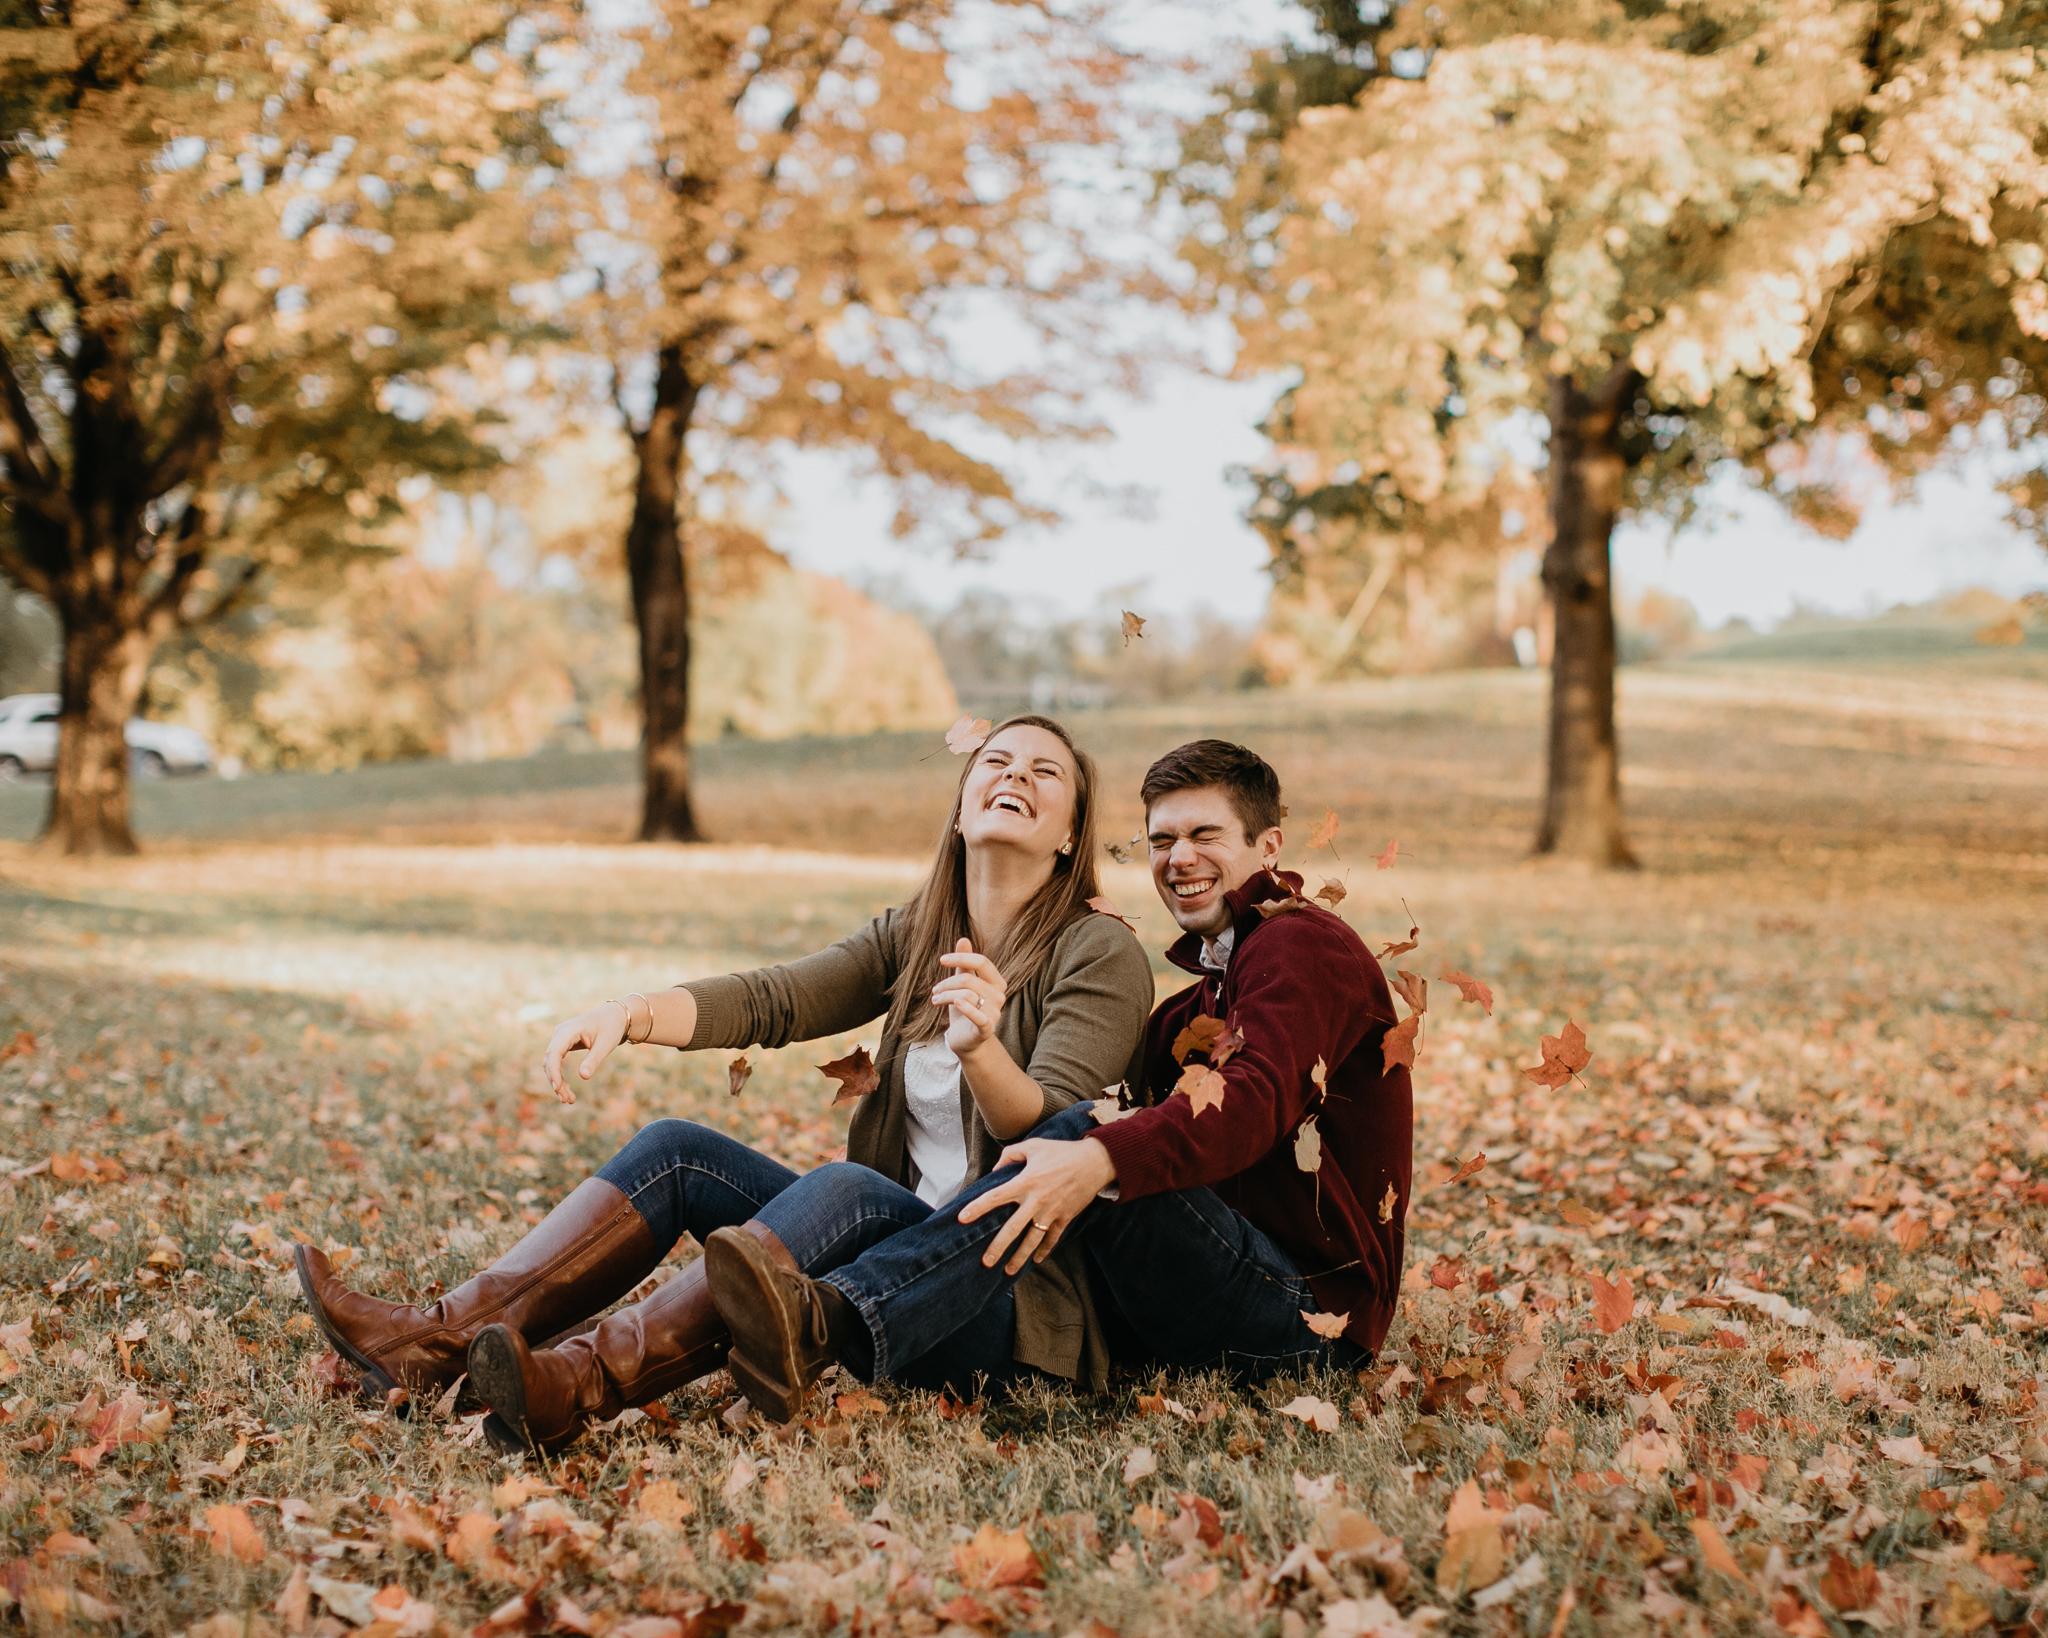 Engagement-Wedding-Photographer-Virginia-Best-Pat-Cori-Photography-4.jpg